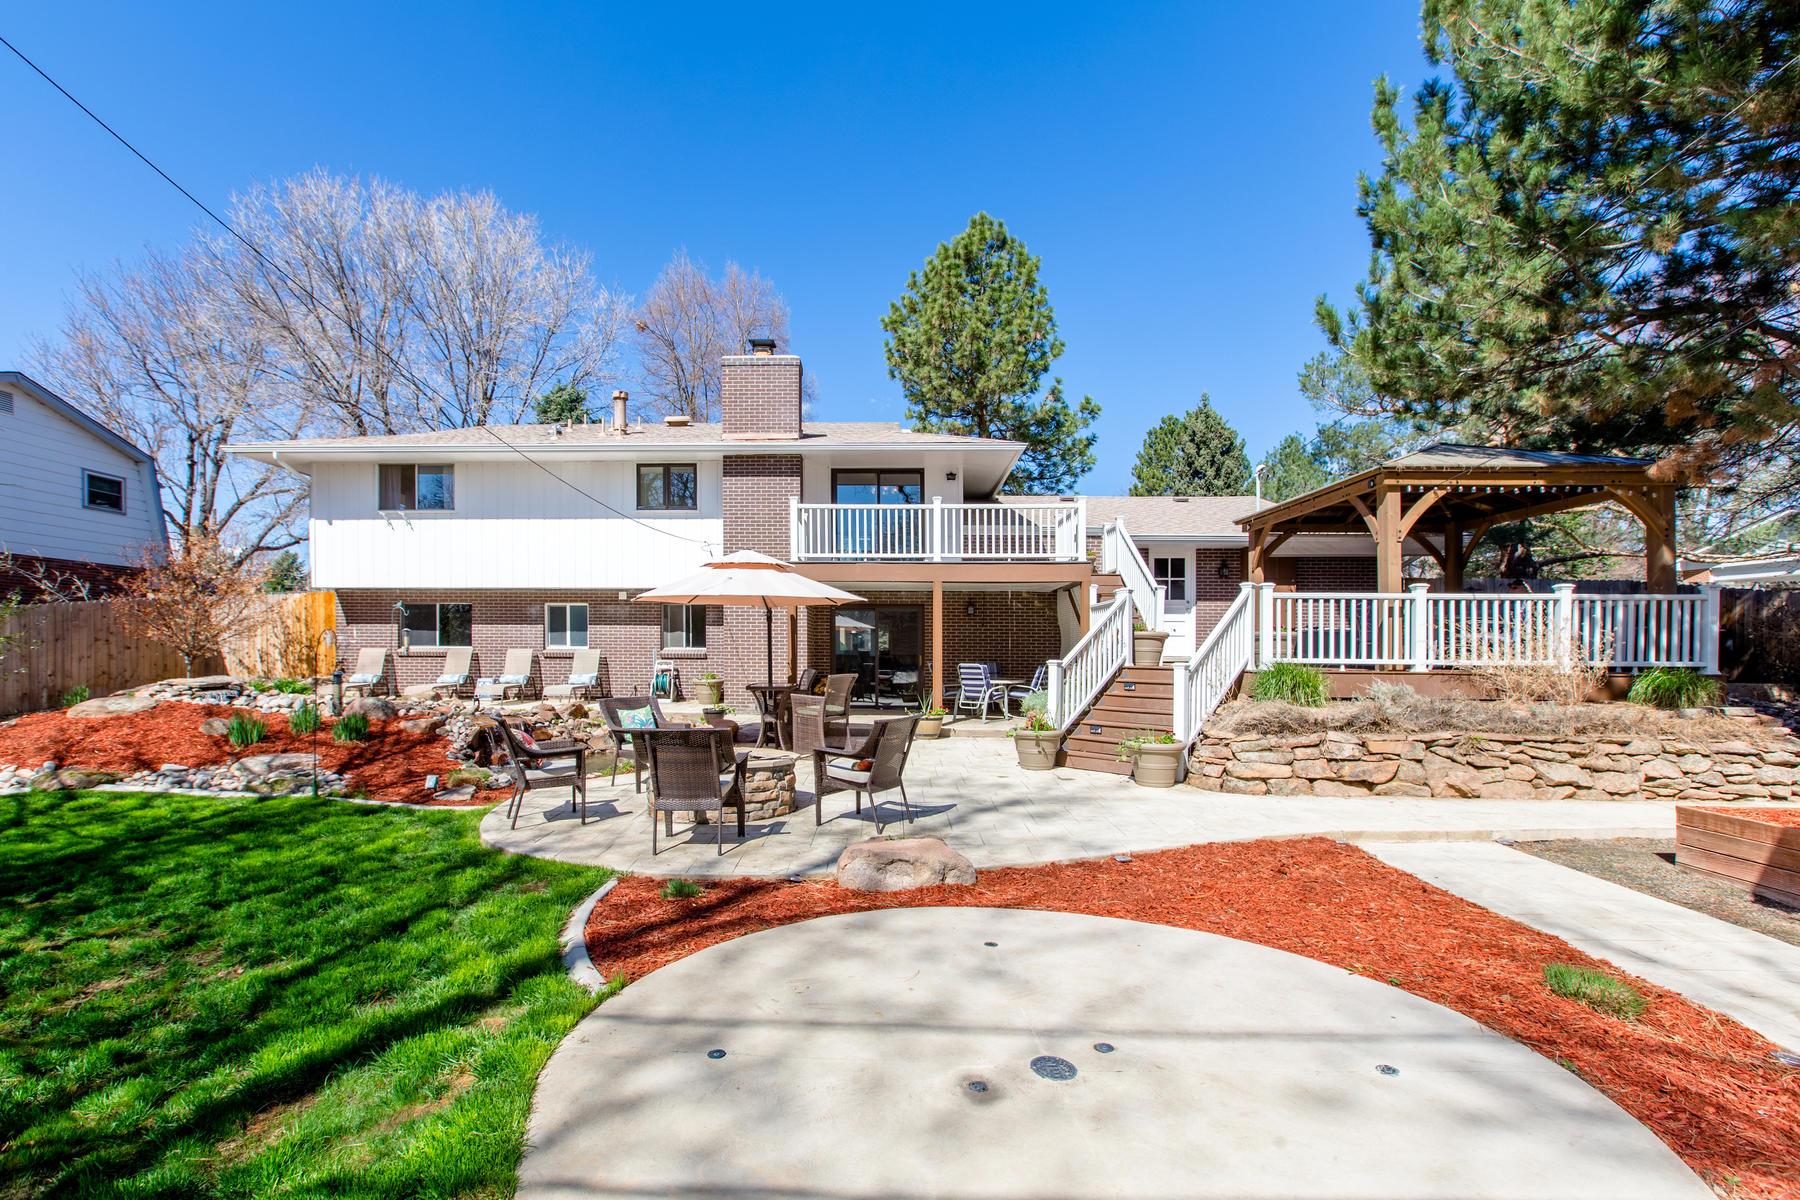 Single Family Homes для того Продажа на Exceptional Mid-Century Stunner on a Premiere Lot 1164 Par Road, Broomfield, Колорадо 80020 Соединенные Штаты